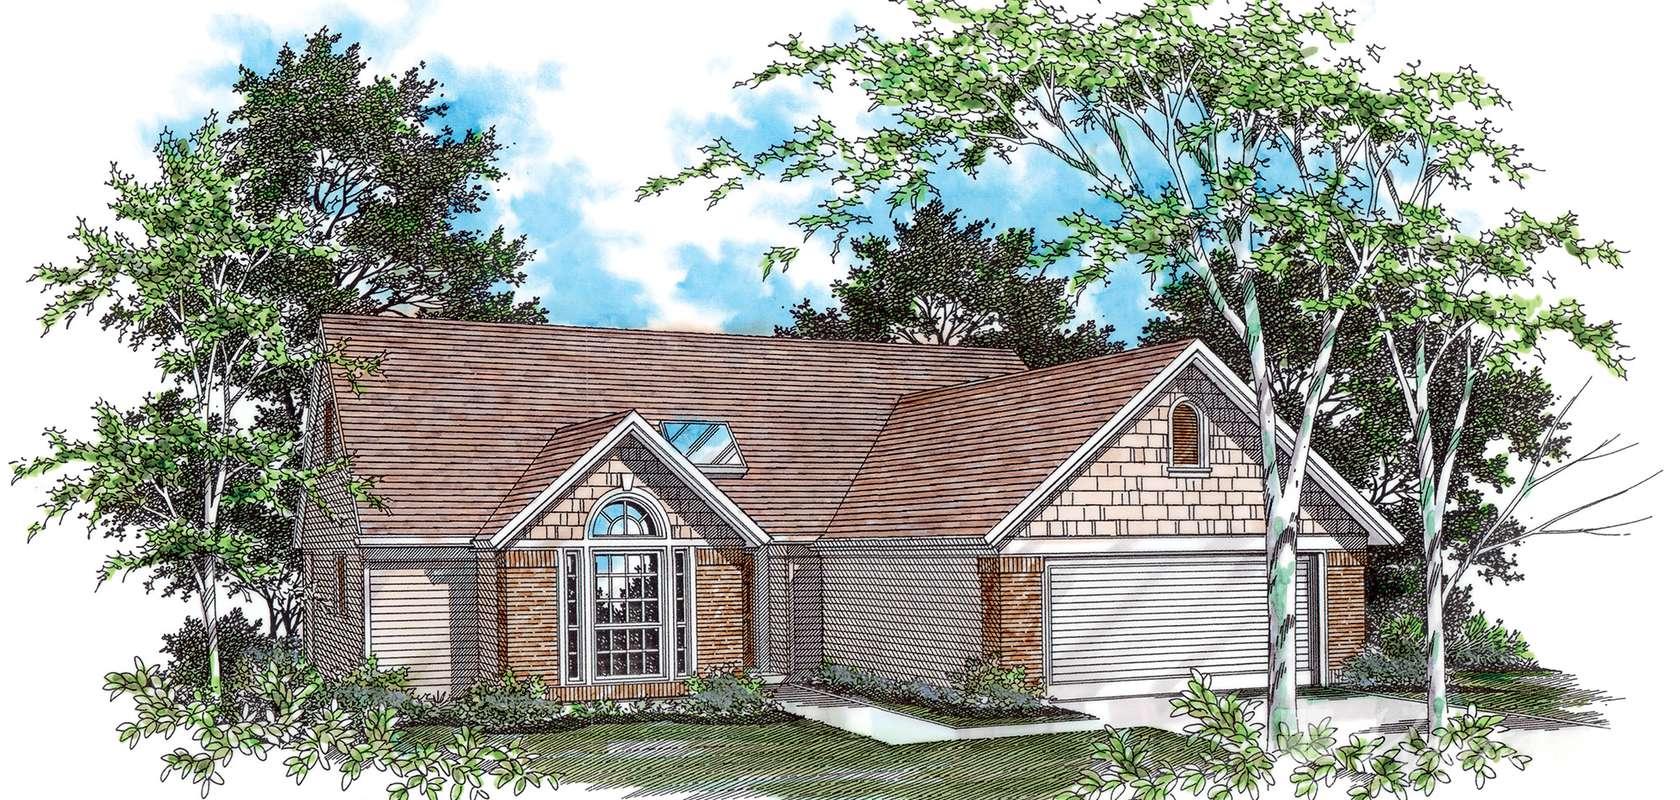 Mascord House Plan 1106A: The Harrigans